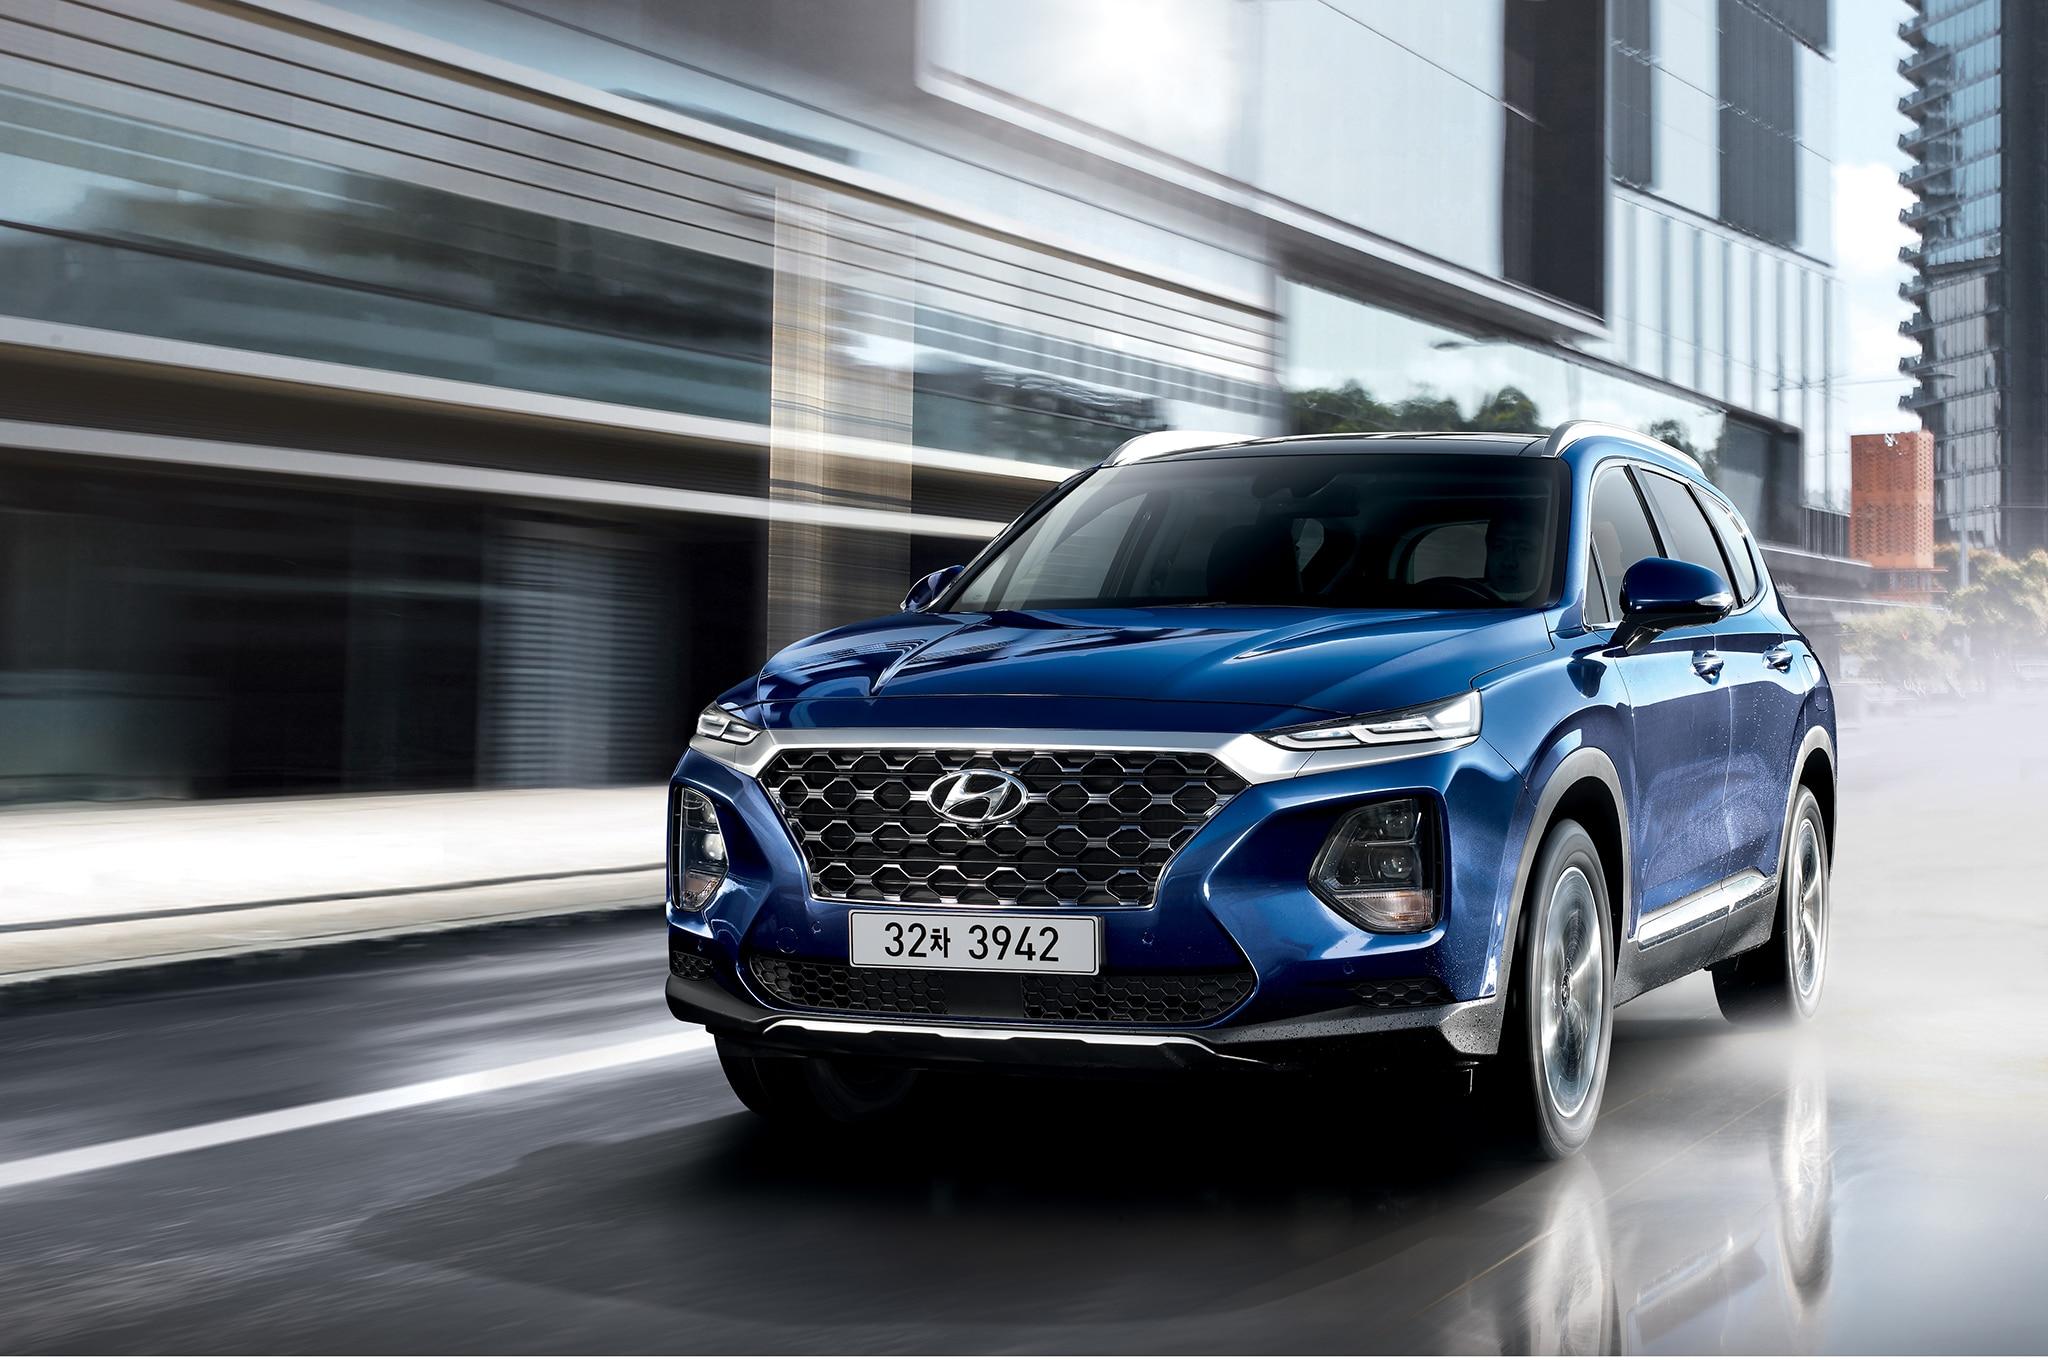 2019 Hyundai Santa Fe Korean Market Front Three Quarter In Motion 1